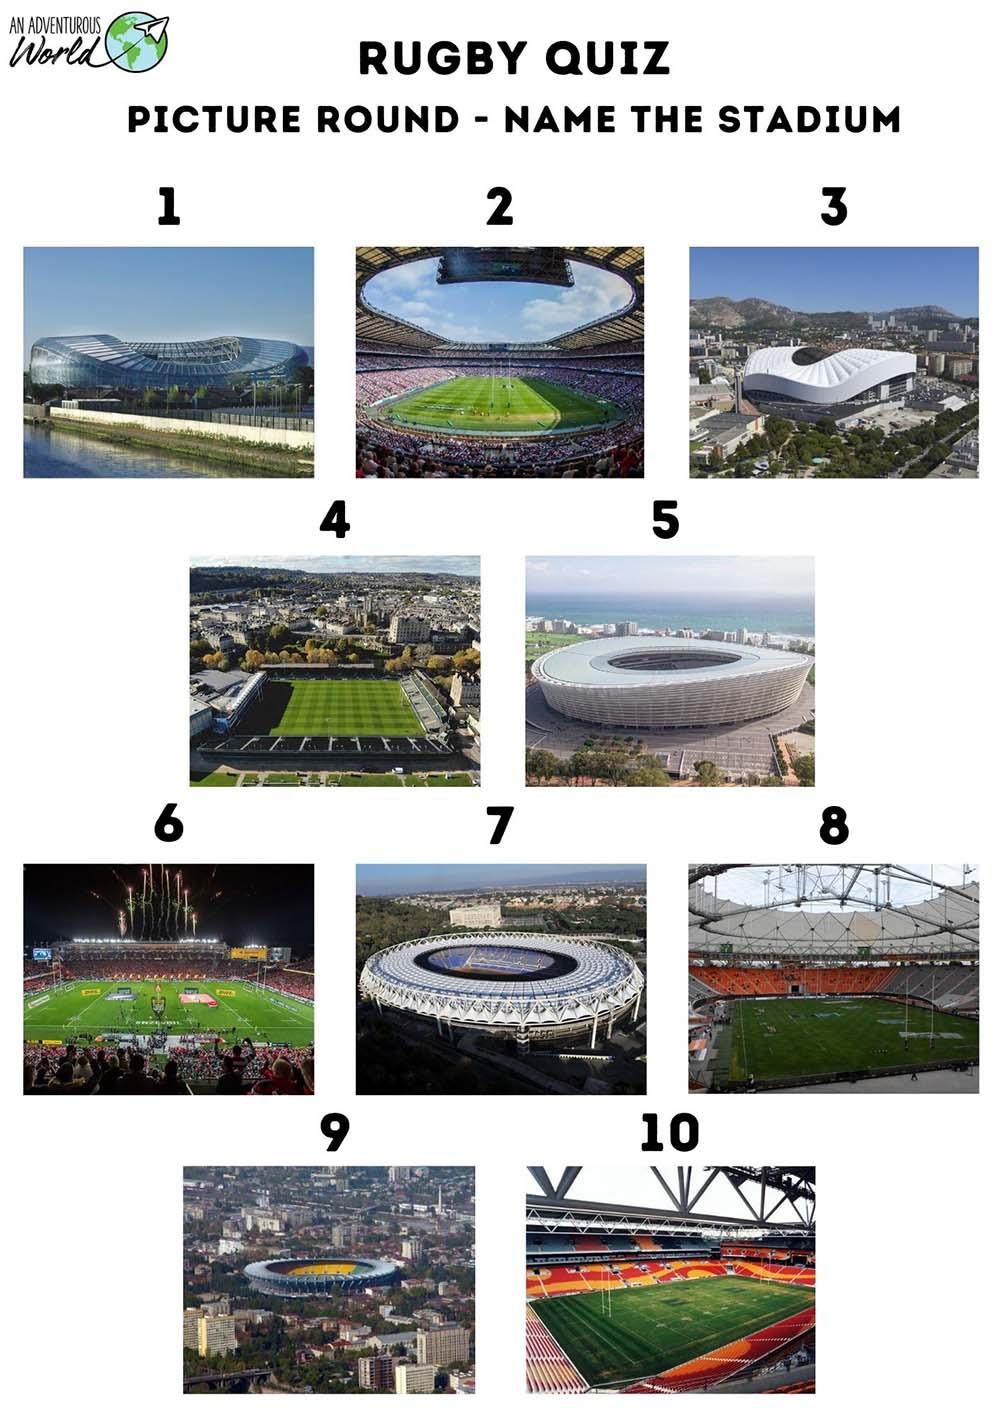 rugby stadiums quiz